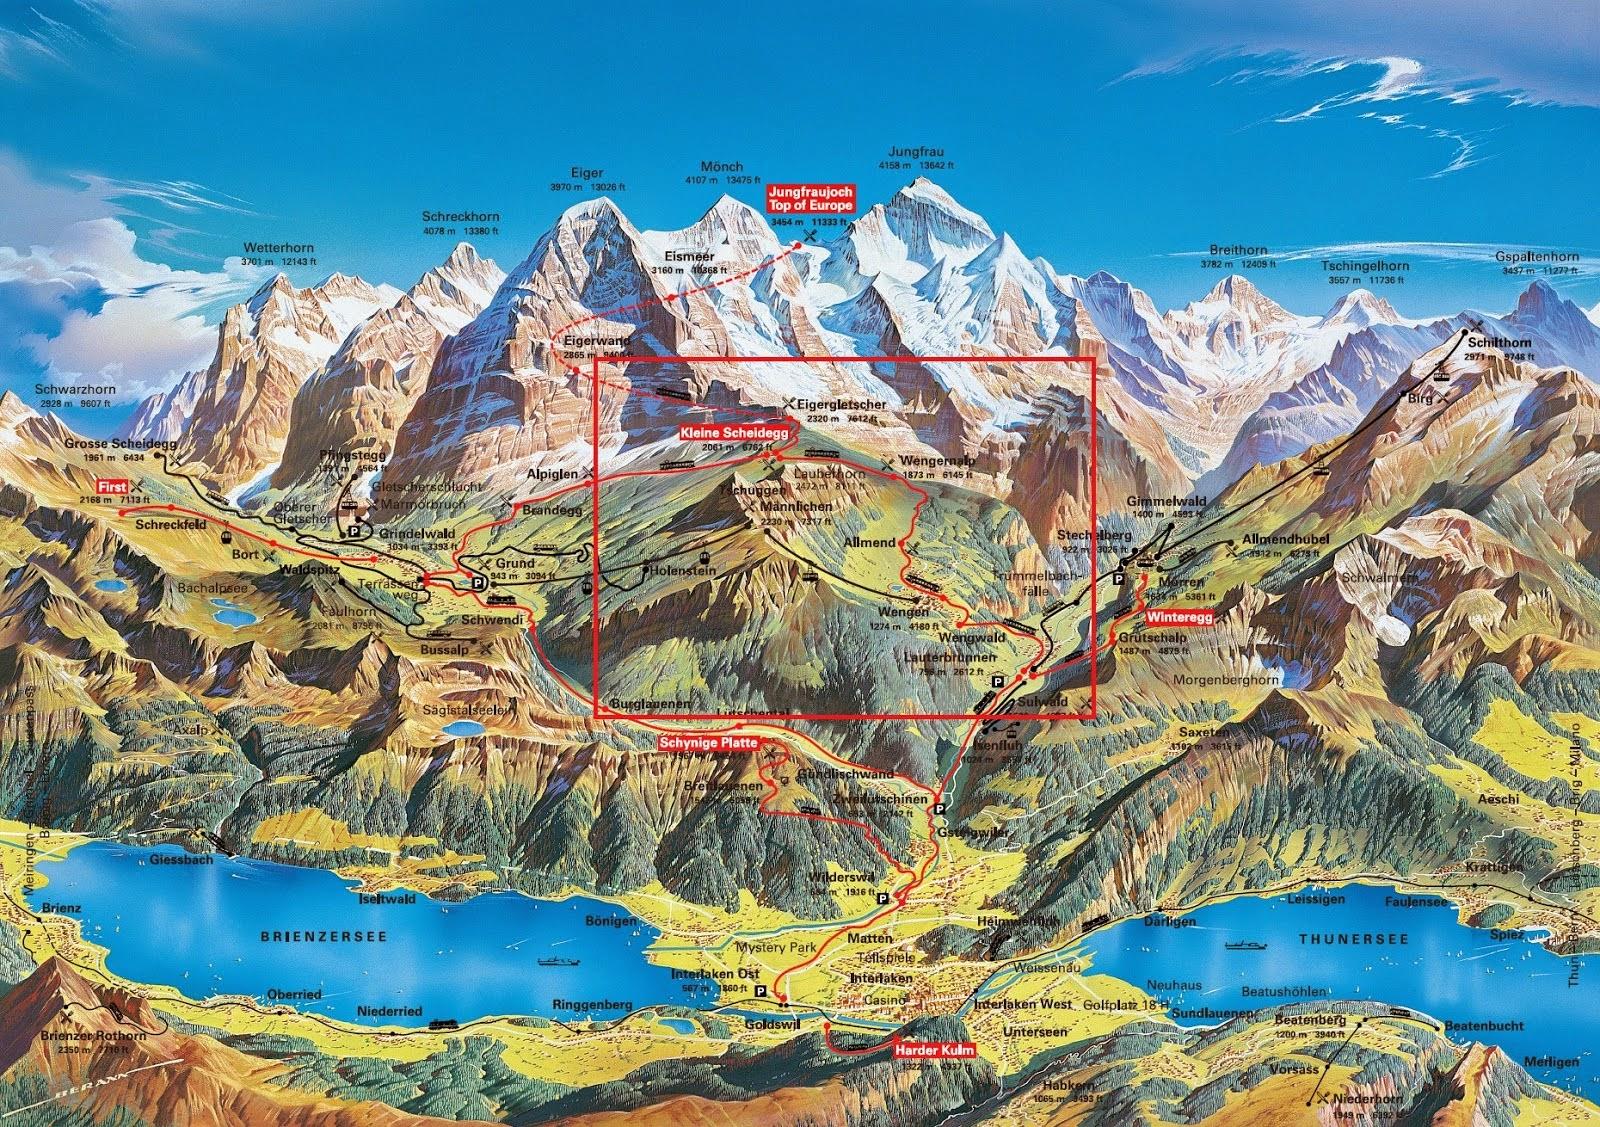 The Ecosystem of the Swiss Alps: Swiss Alps: Alpine Glacial ...